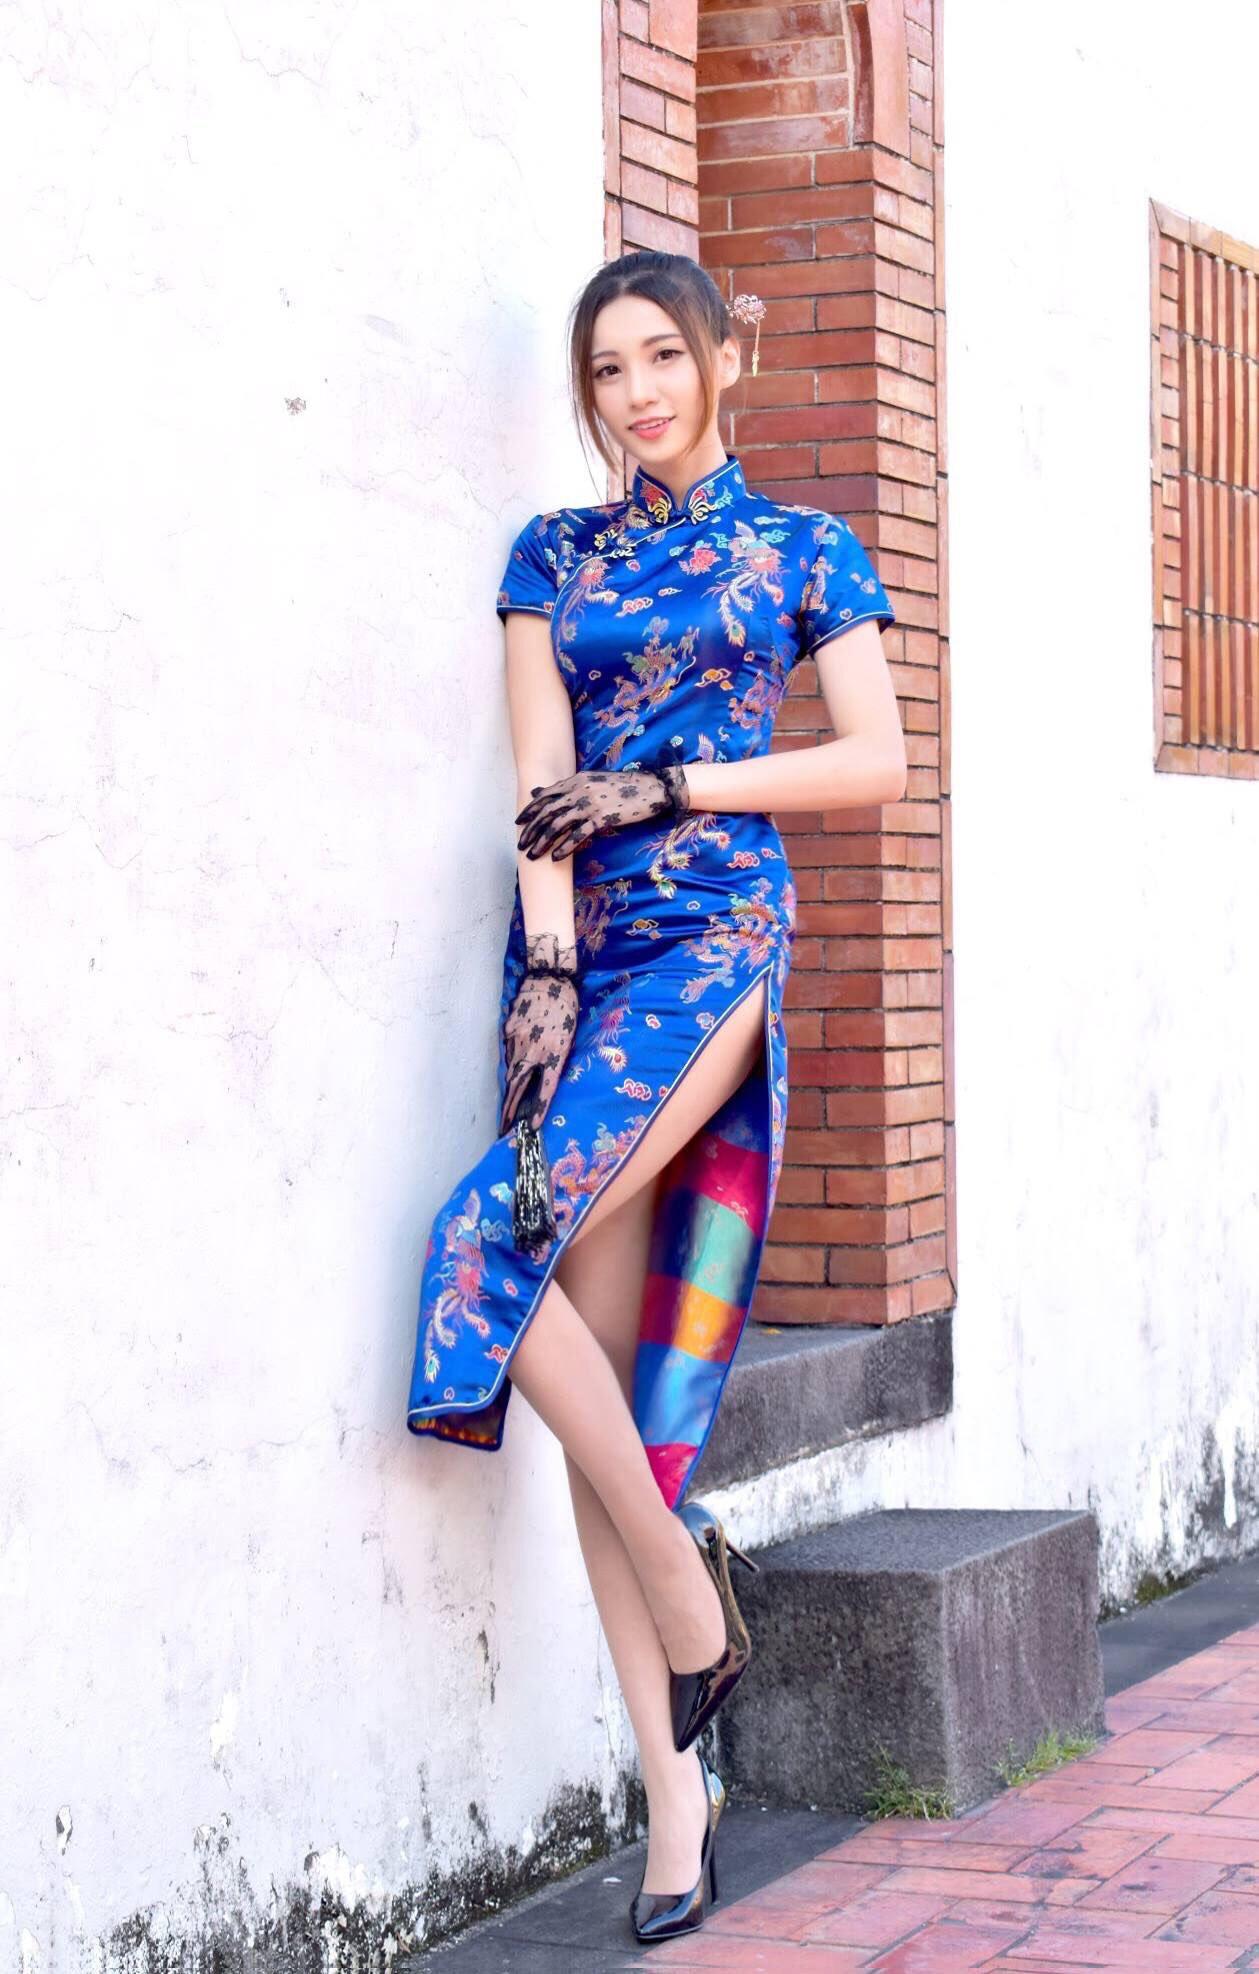 Candice蔡译心の美脚 12